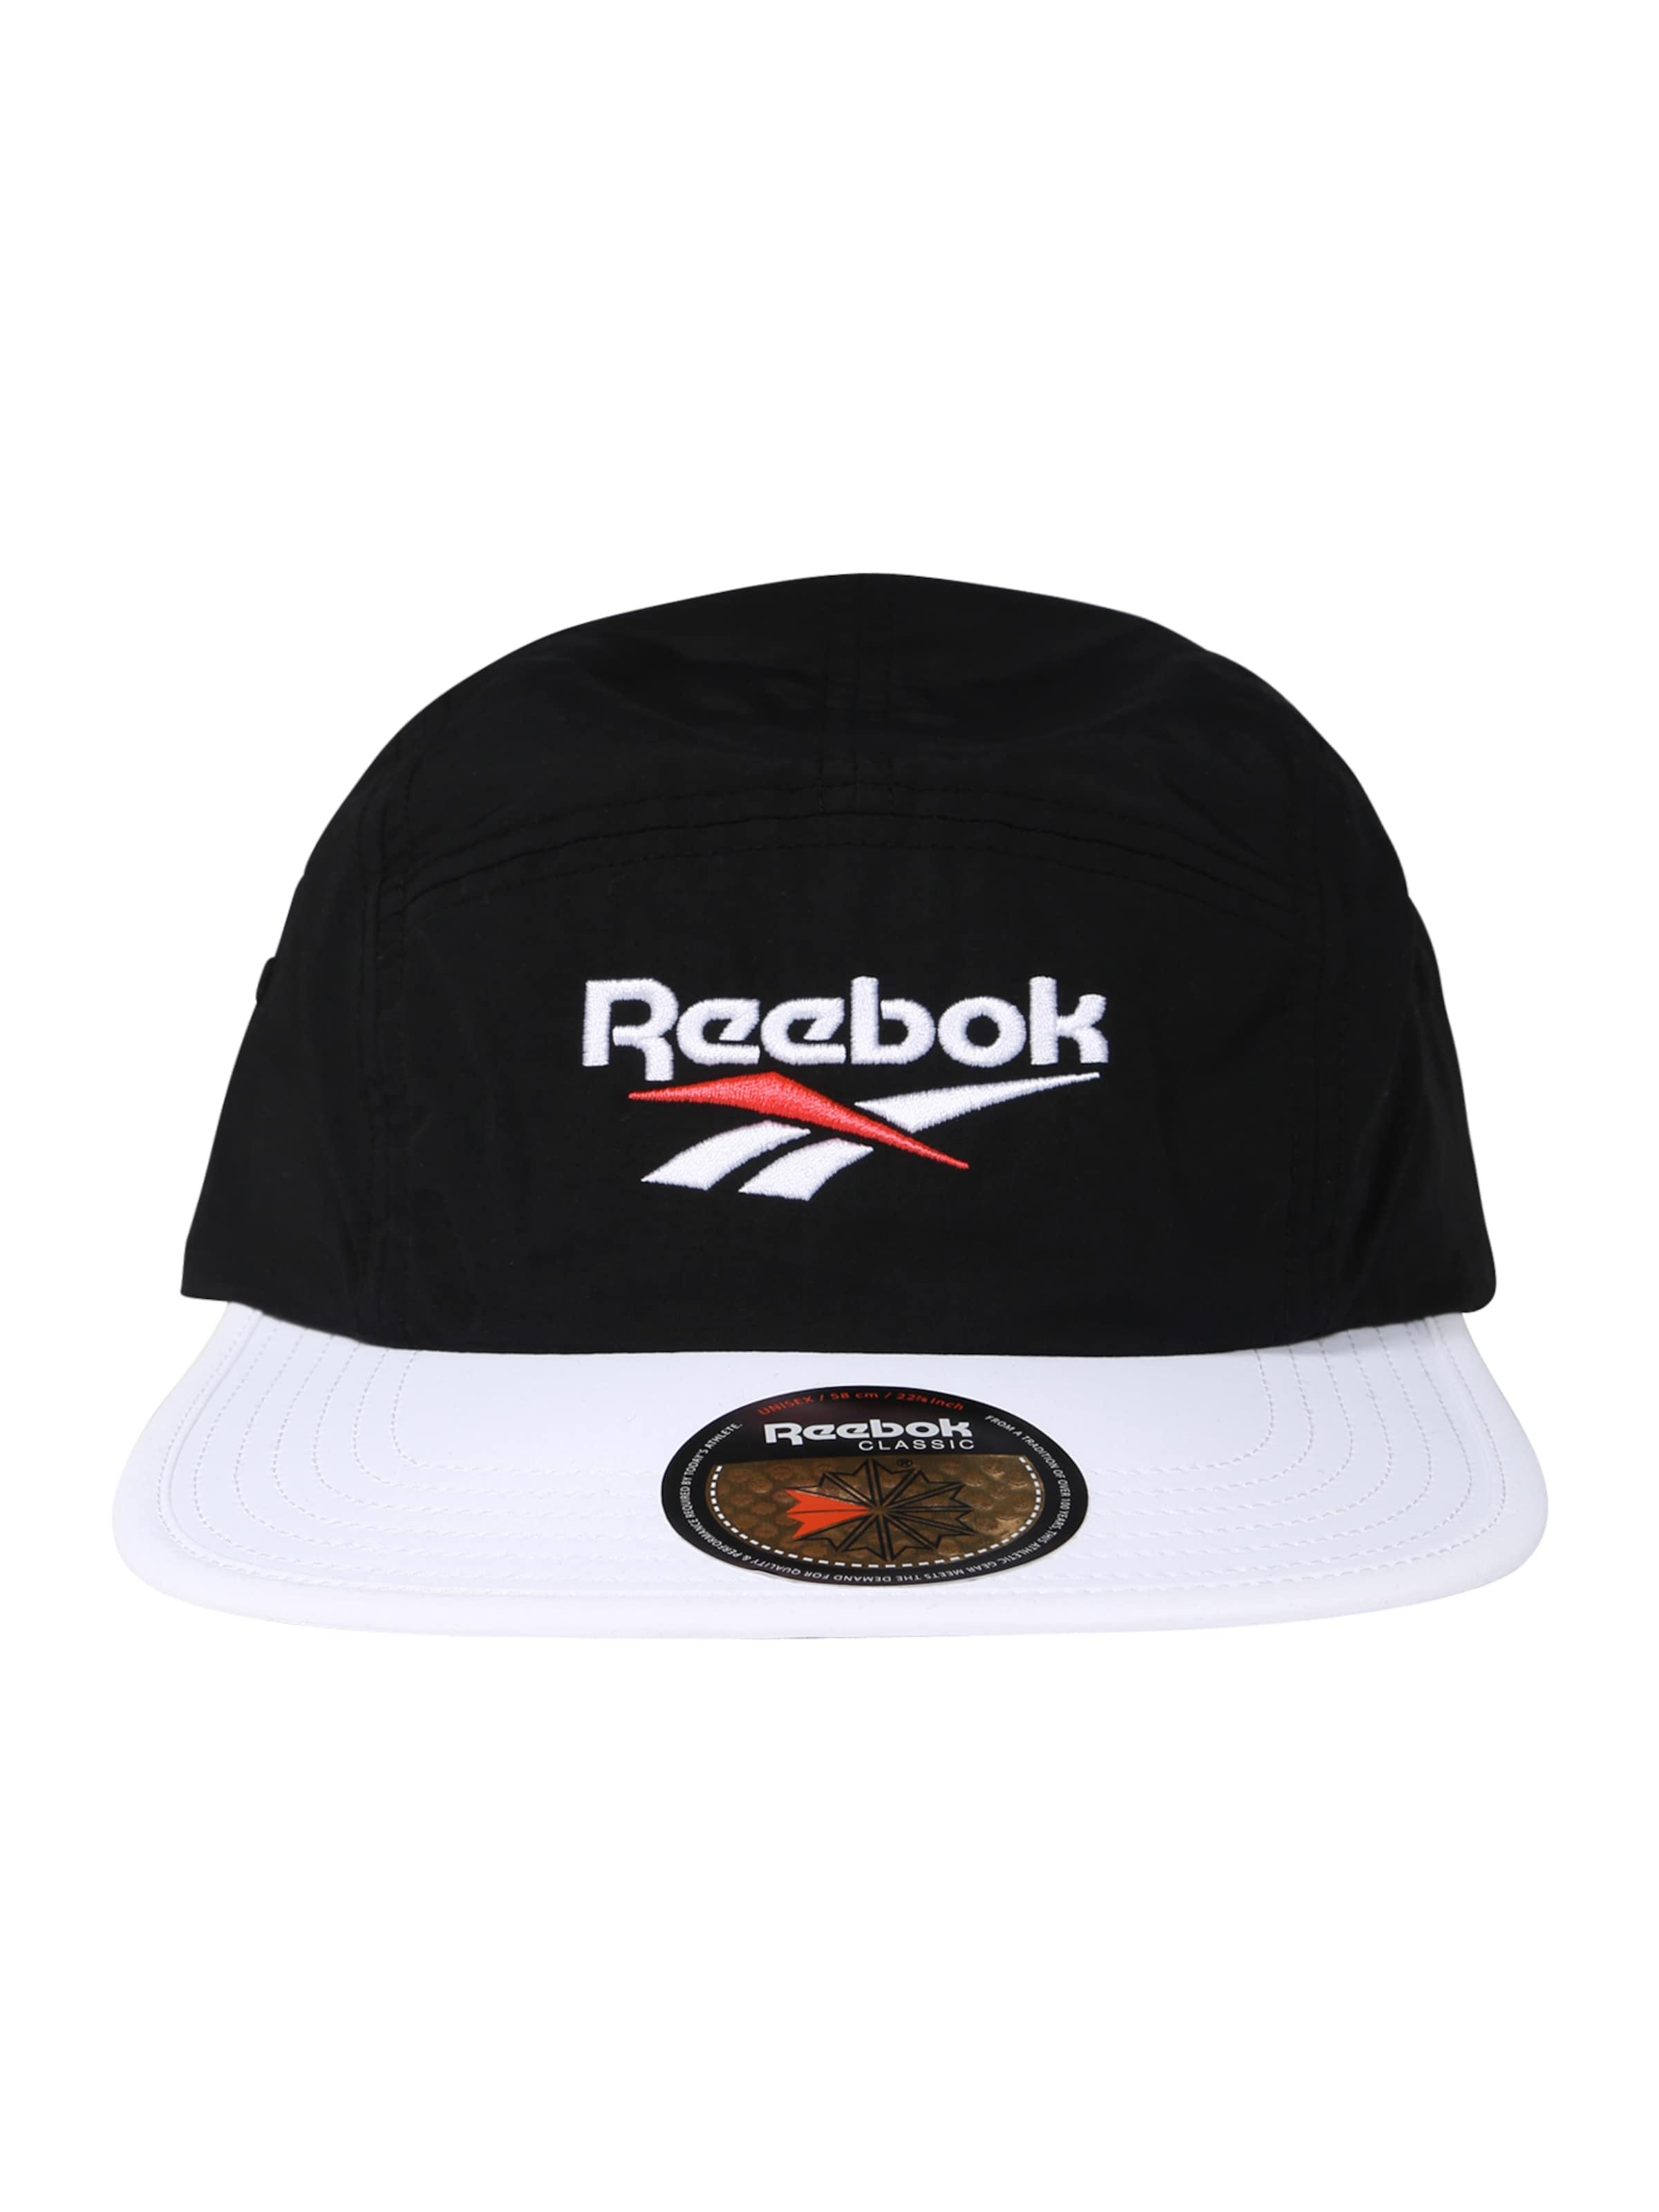 Running' Reebok 'retro In Weiß Cap Classic RotSchwarz eBCxod